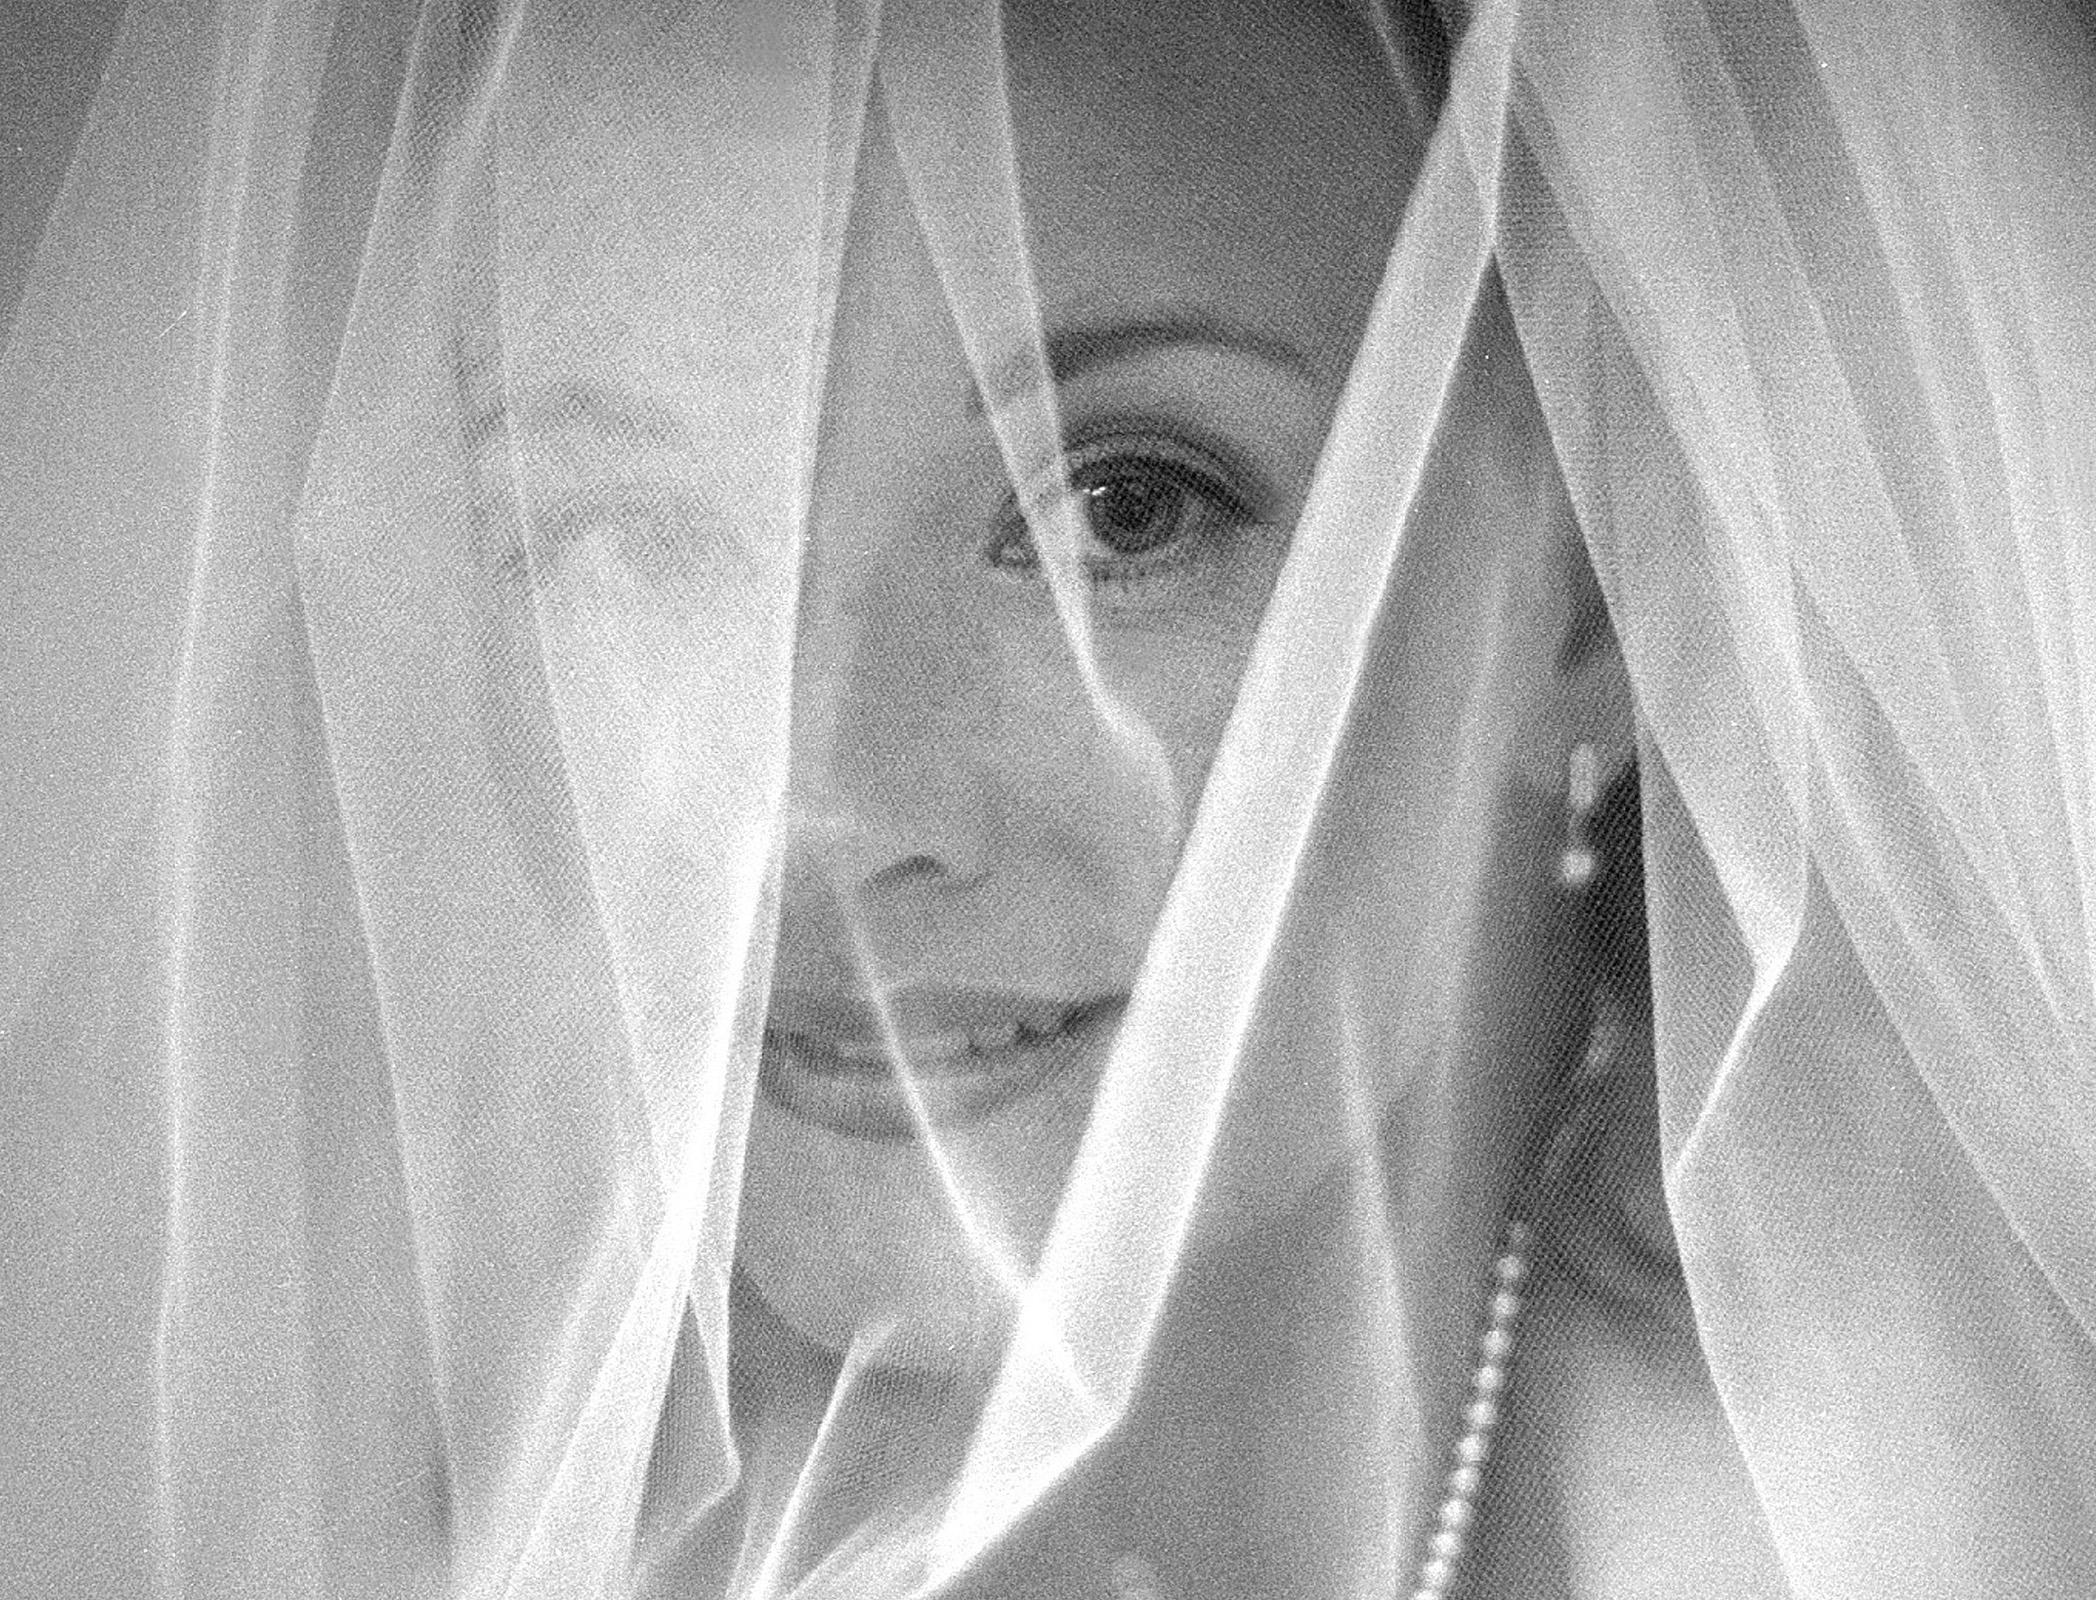 Veiled bride waits in car